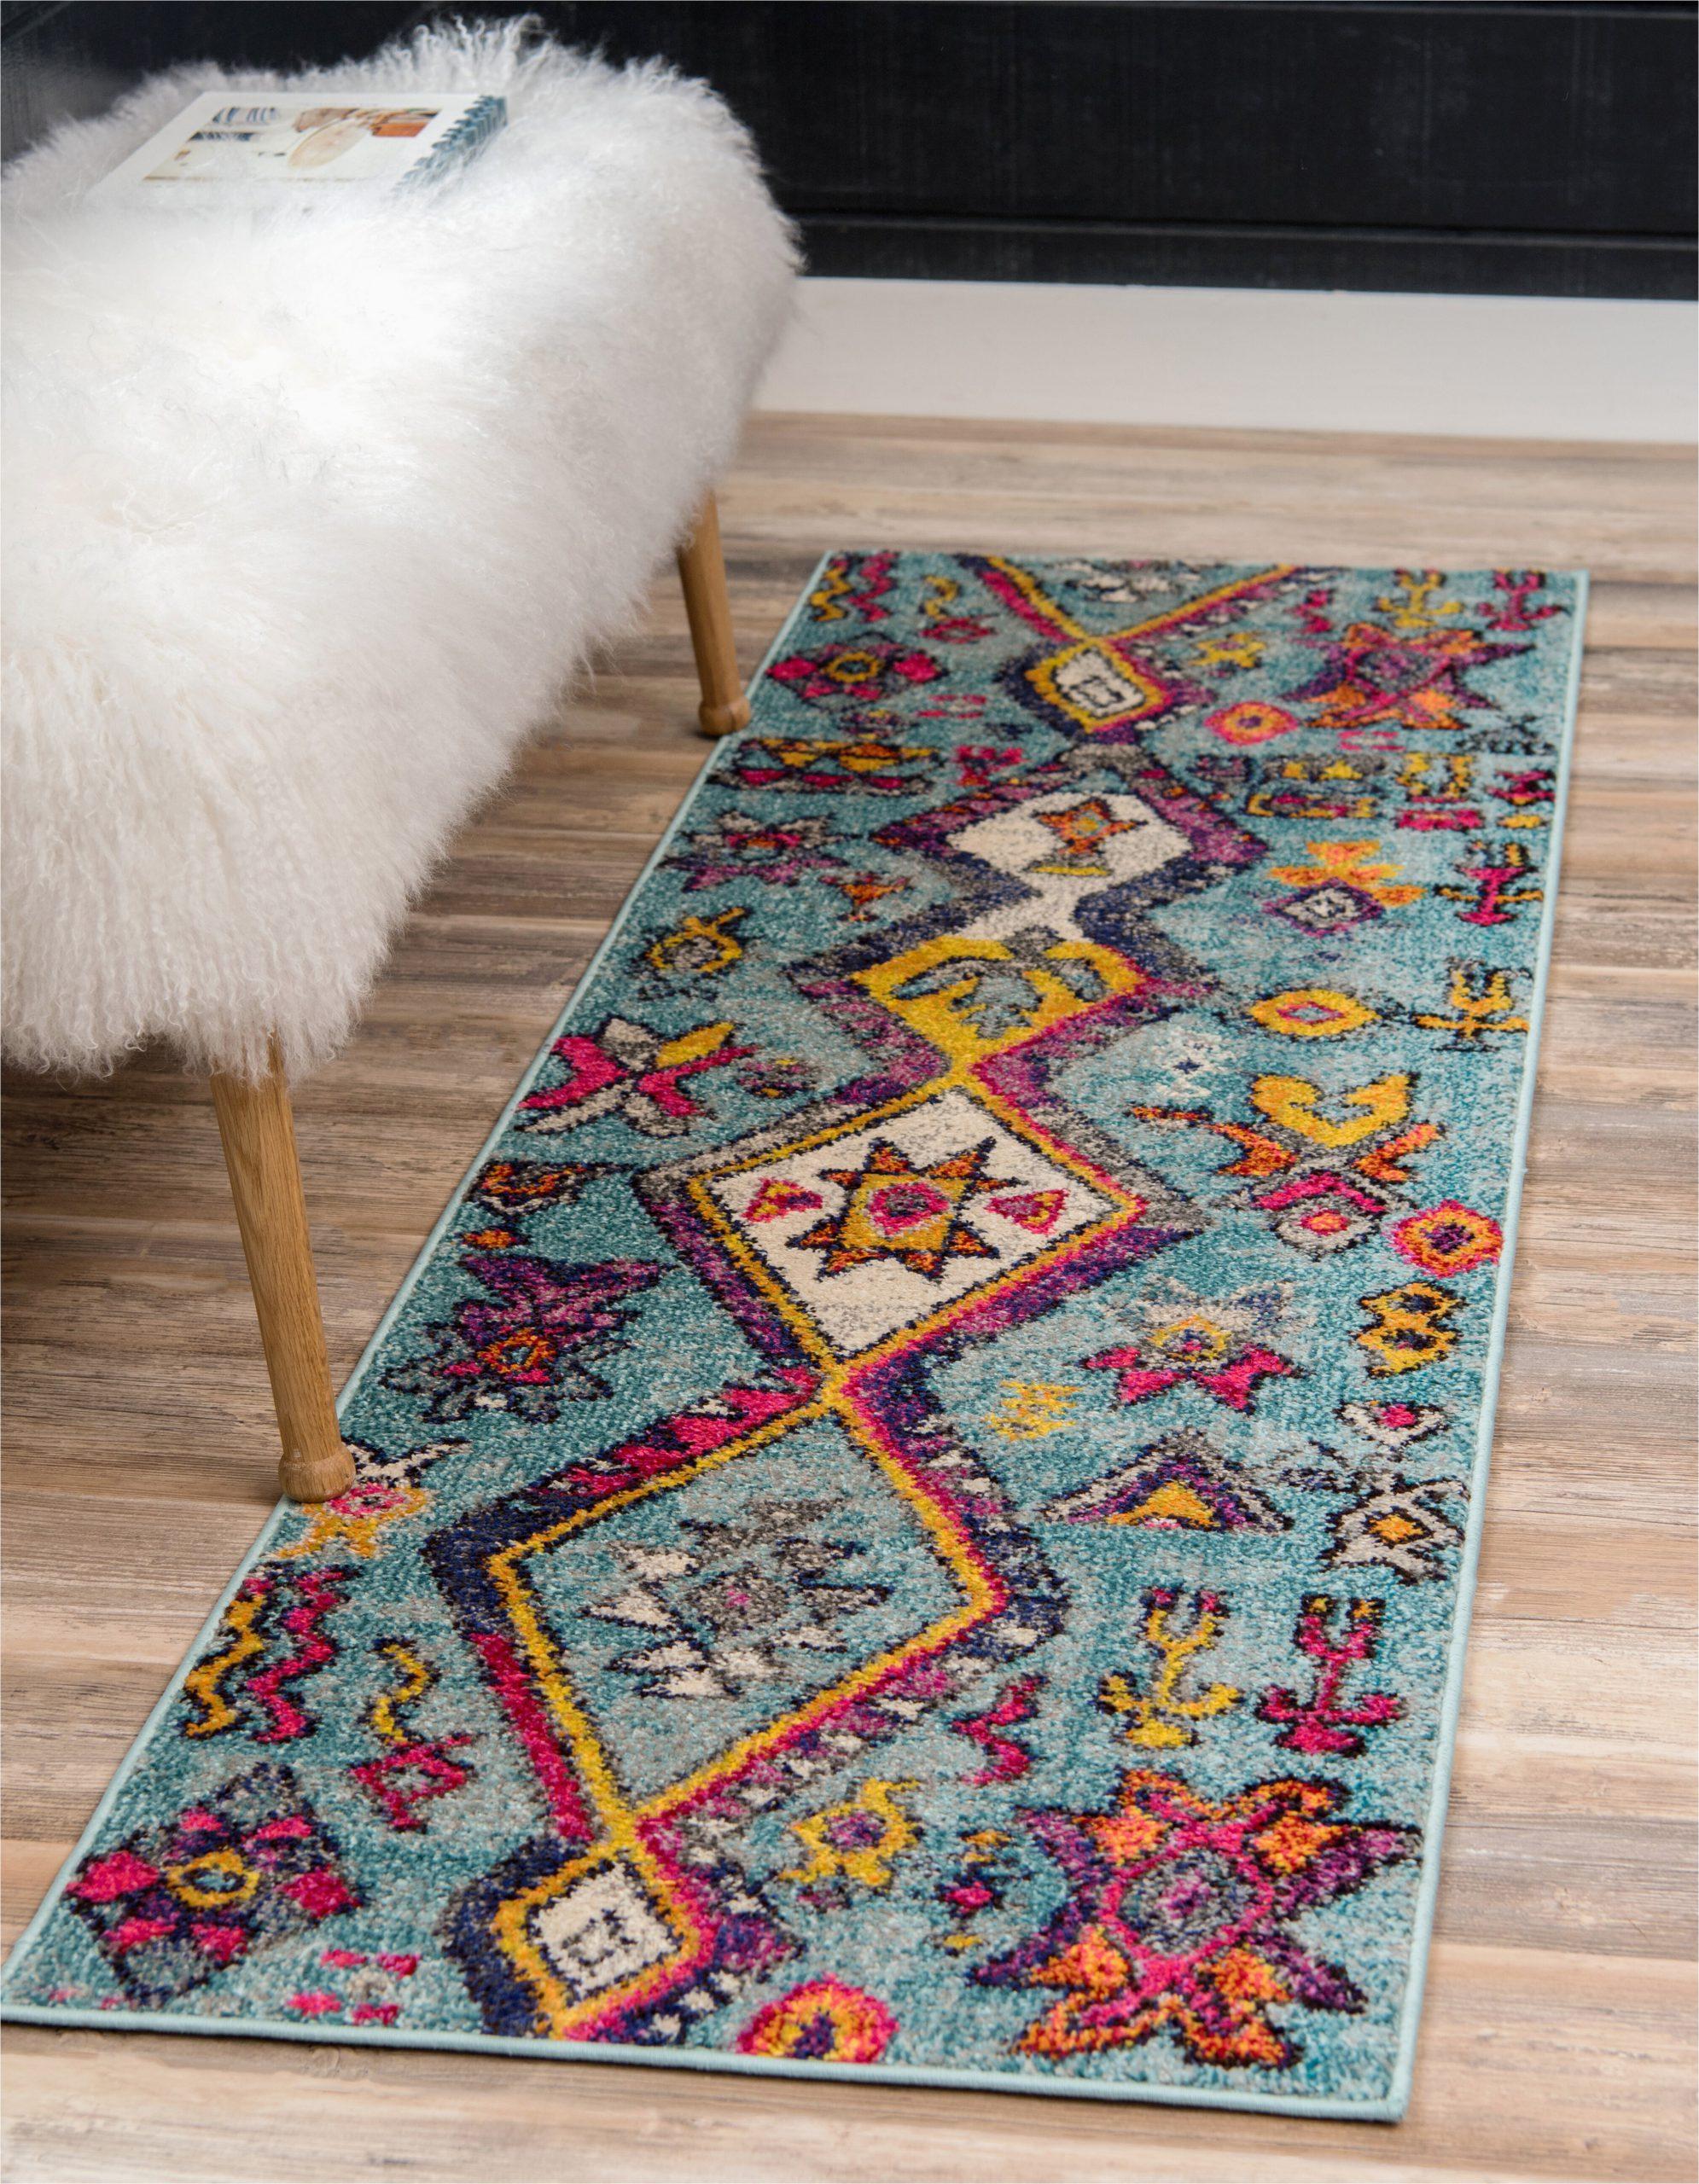 ariyah turquoise area rug bgrs4695 piid=